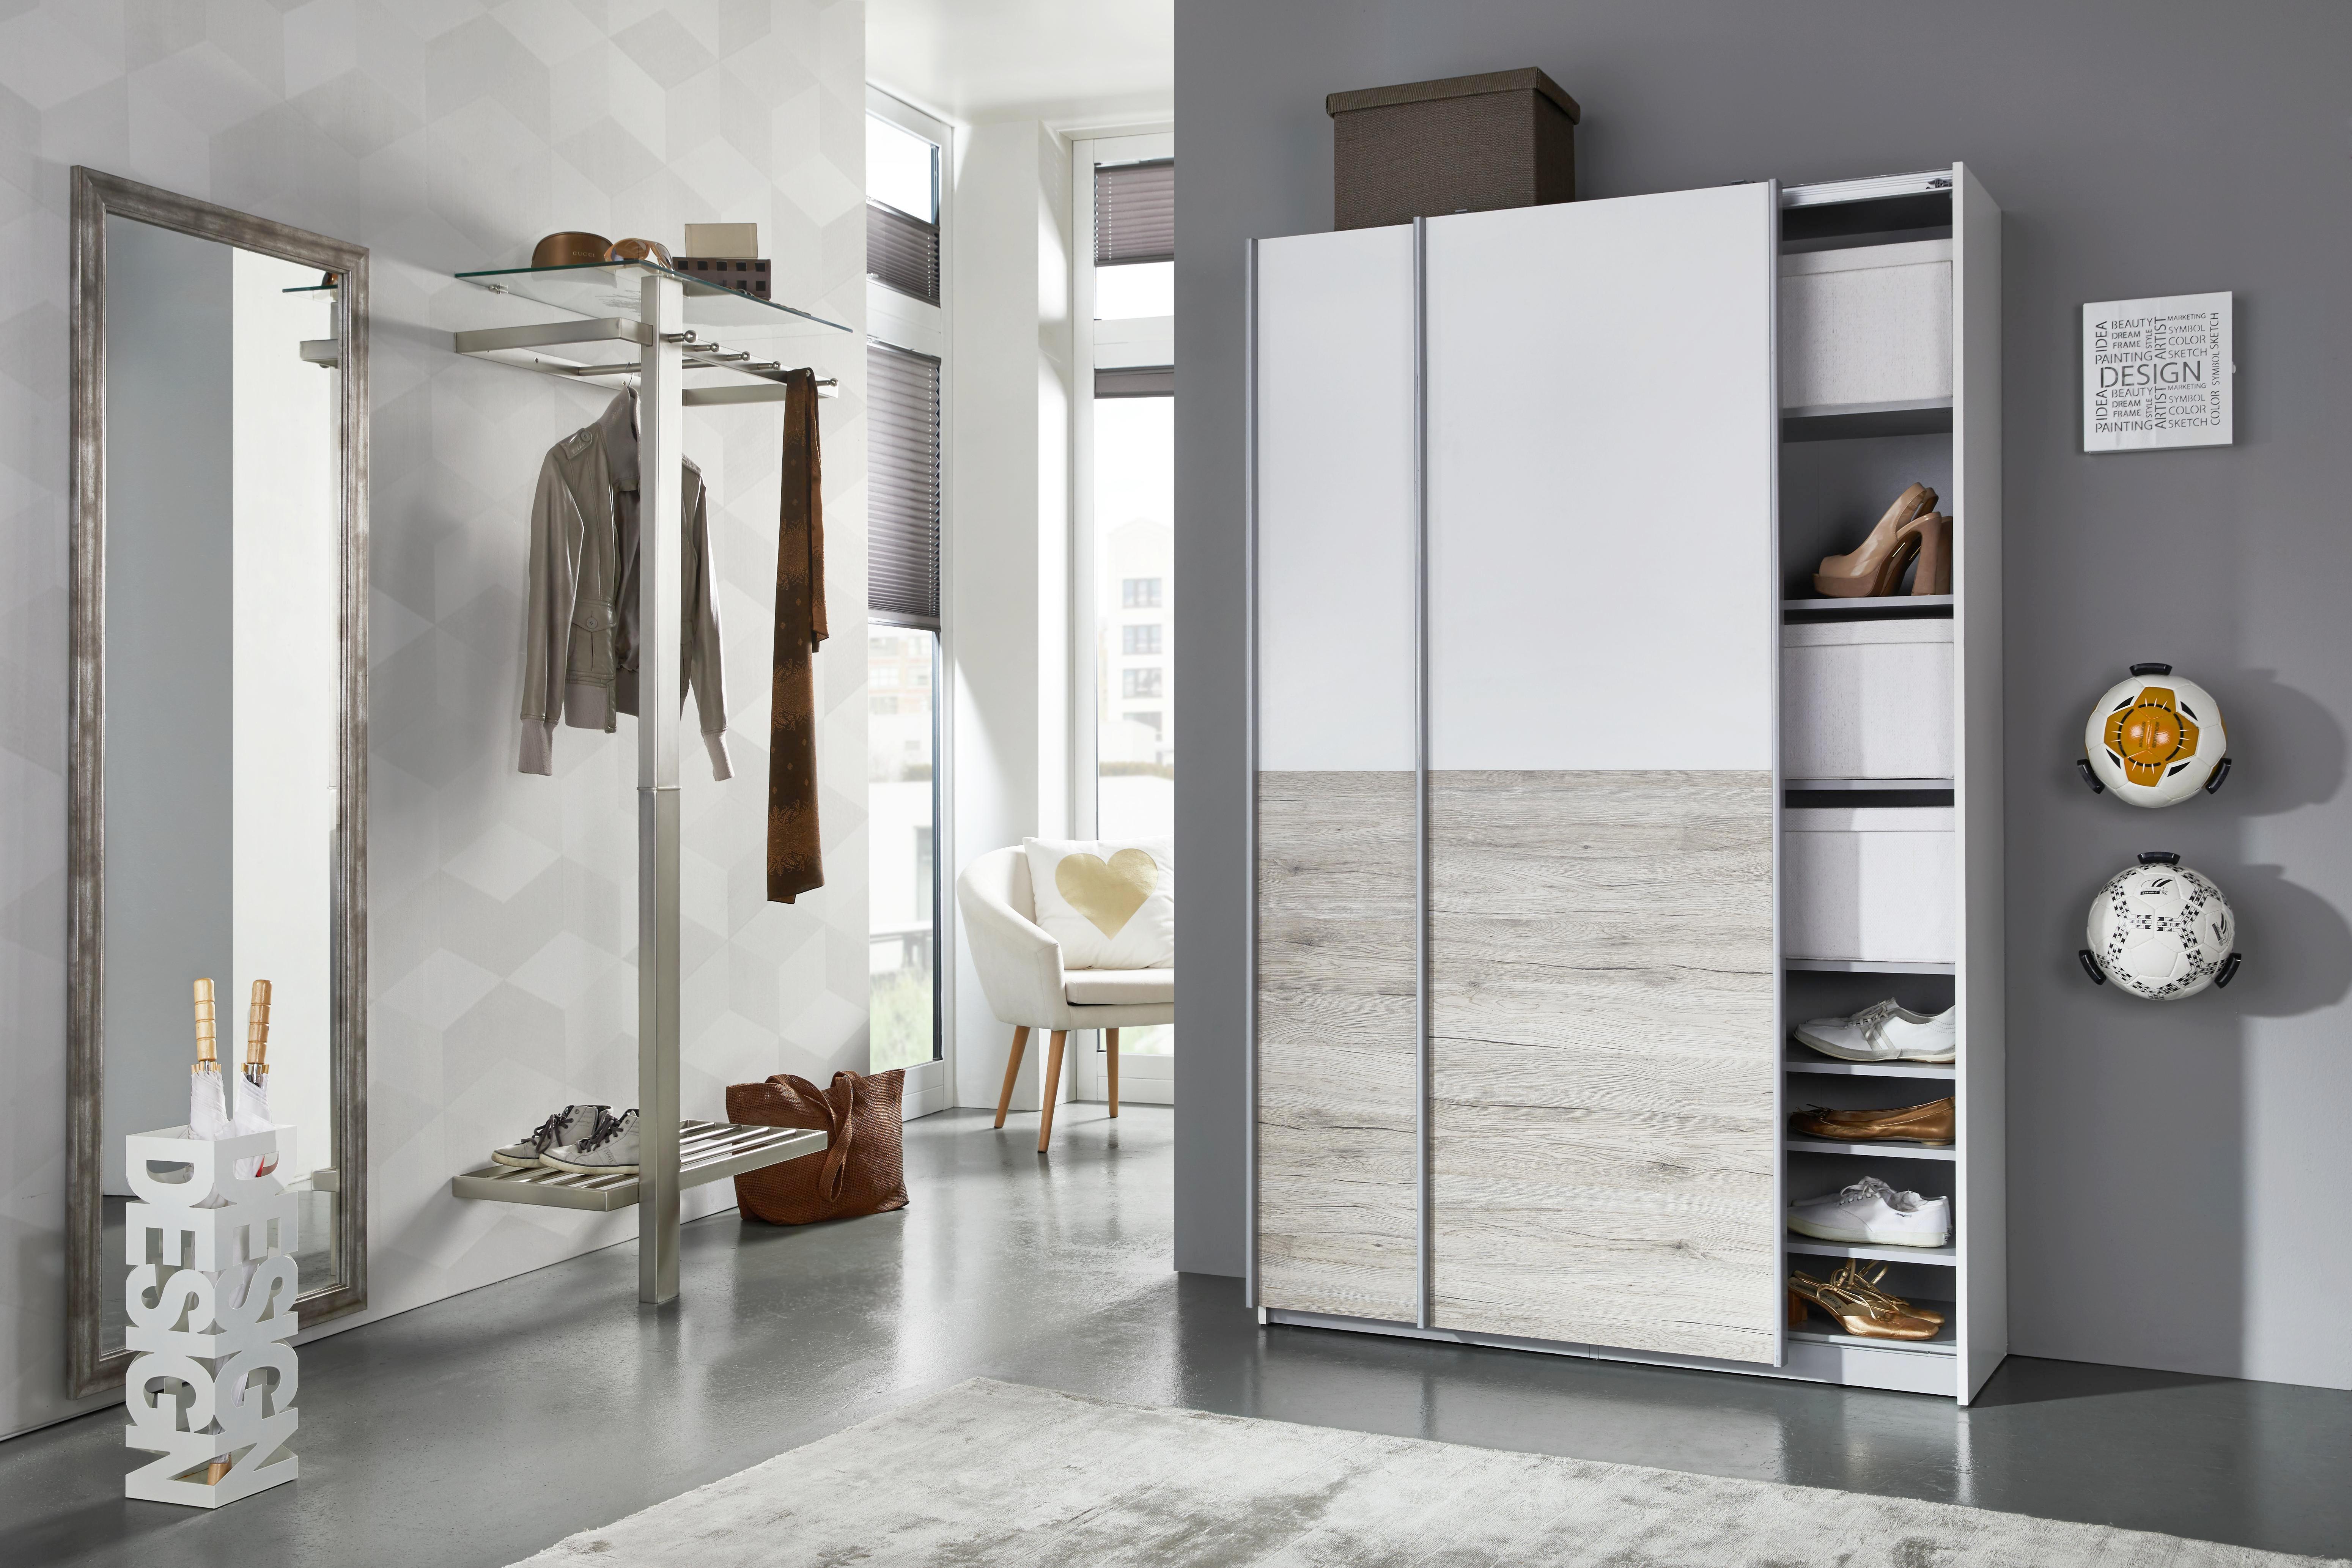 Einlegebodenset in Grau, 2er Pack - Grau, Holz/Metall (57,7/32/1,5cm) - MÖMAX modern living